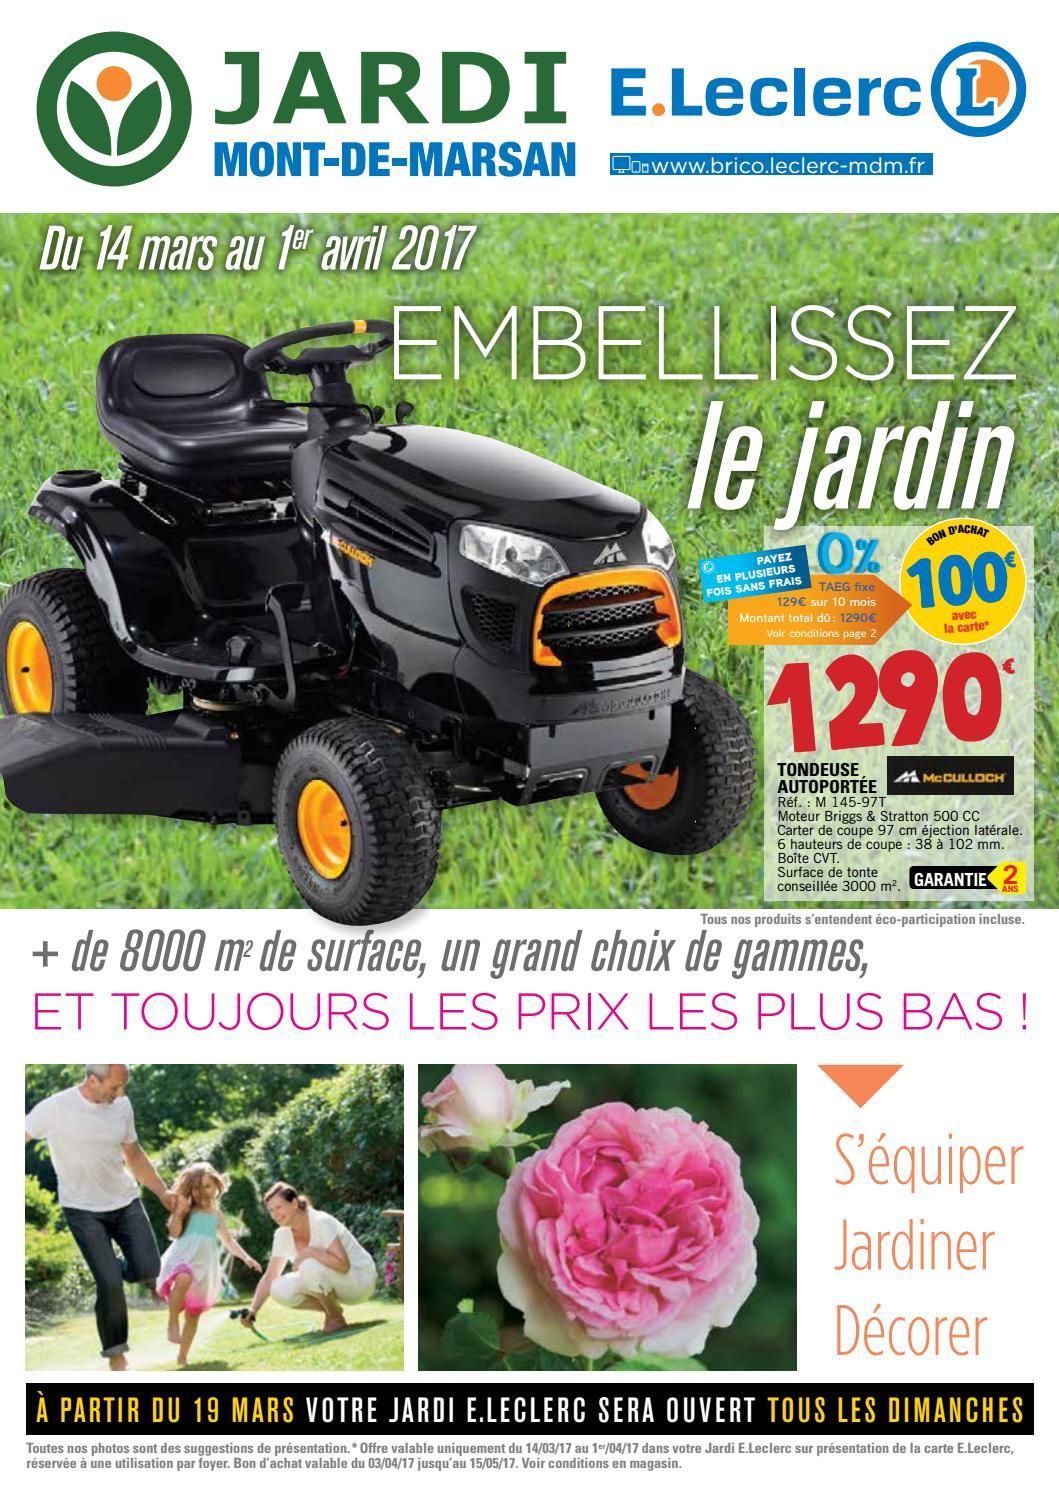 Paf Bd Bbj Mdm Jardi 68P By Bakana Media Agence Digitale - Issuu tout Piscine Autoportée Leclerc